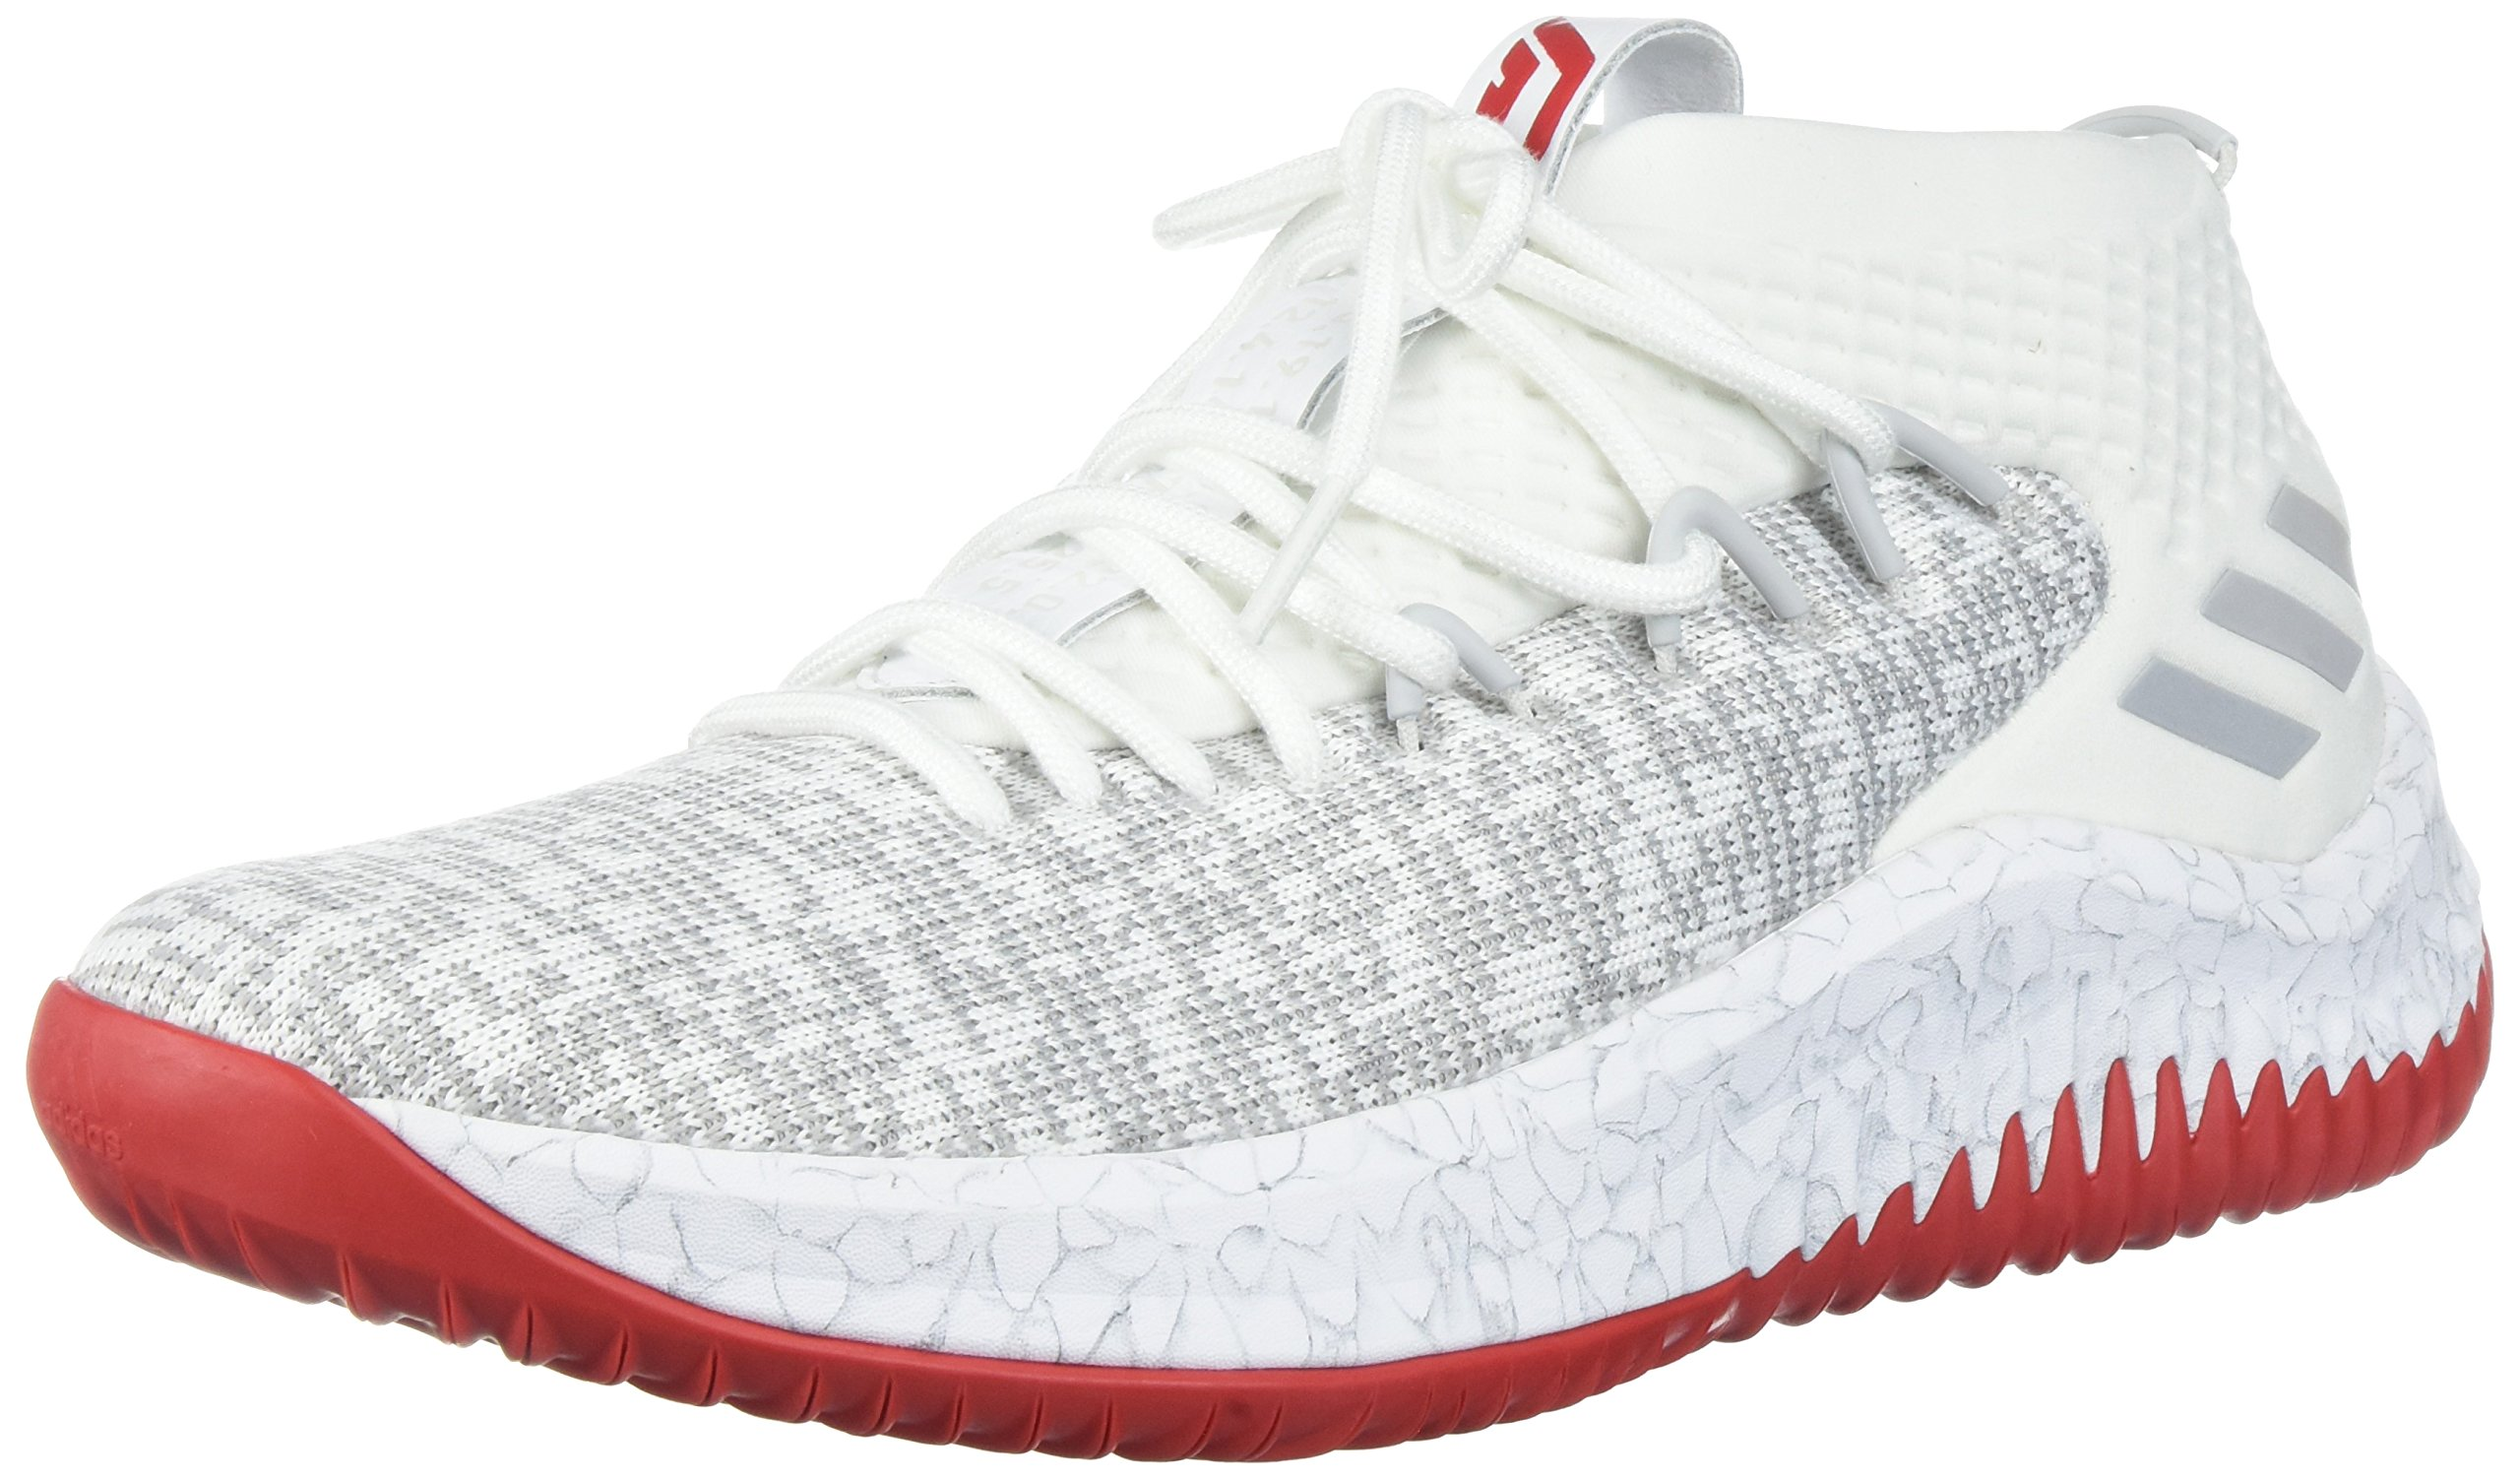 adidas Dame 4 Shoe Men's Basketball, Cloud White/Grey/Scarlet, 10 M US by adidas